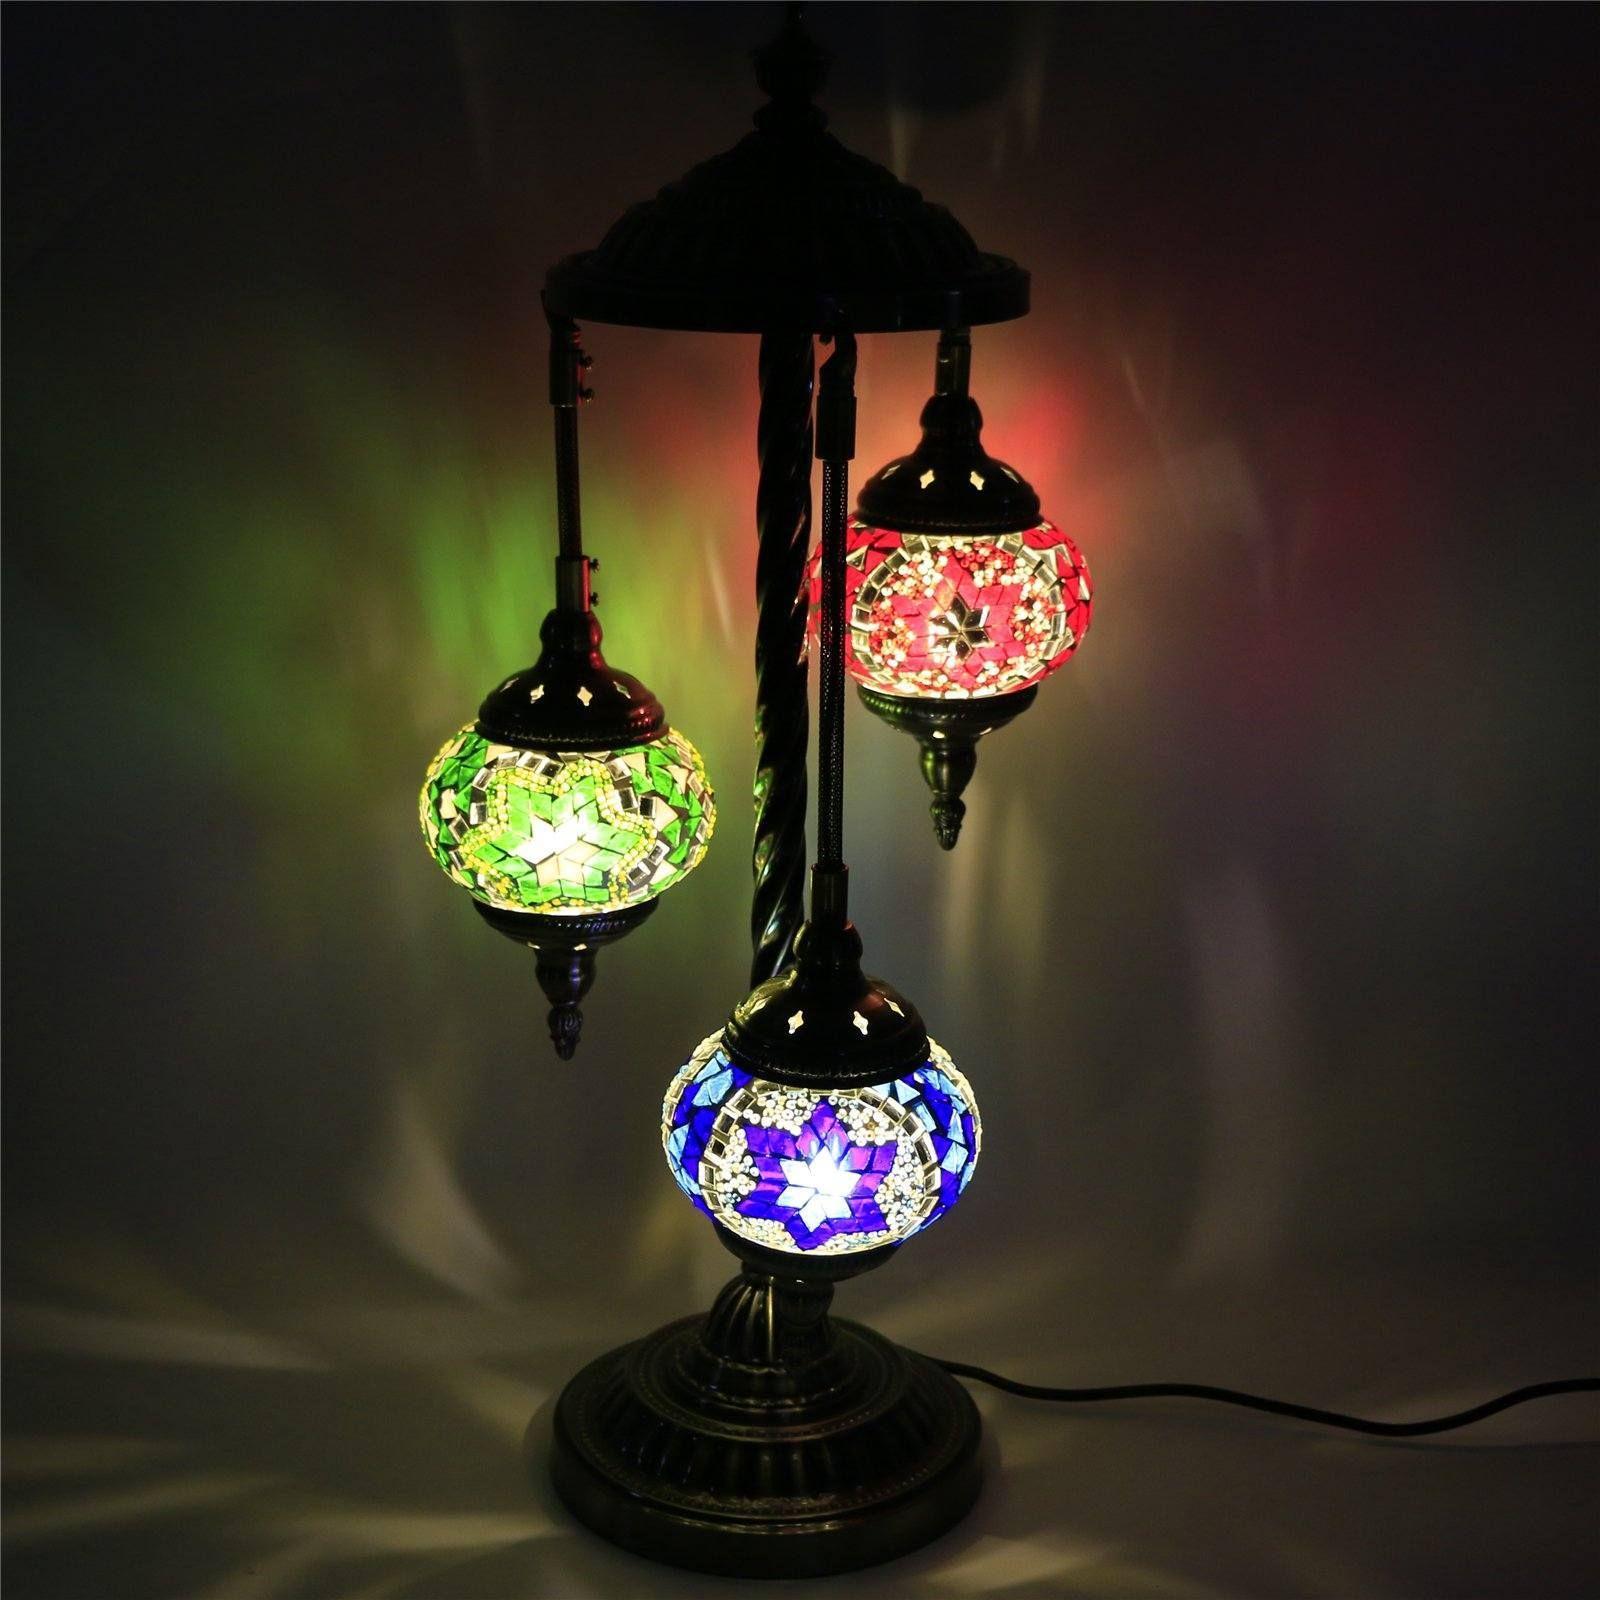 3 Shade Turkish Floor Lamp 27 9 Unique Lamps Modern Lamp Lamp